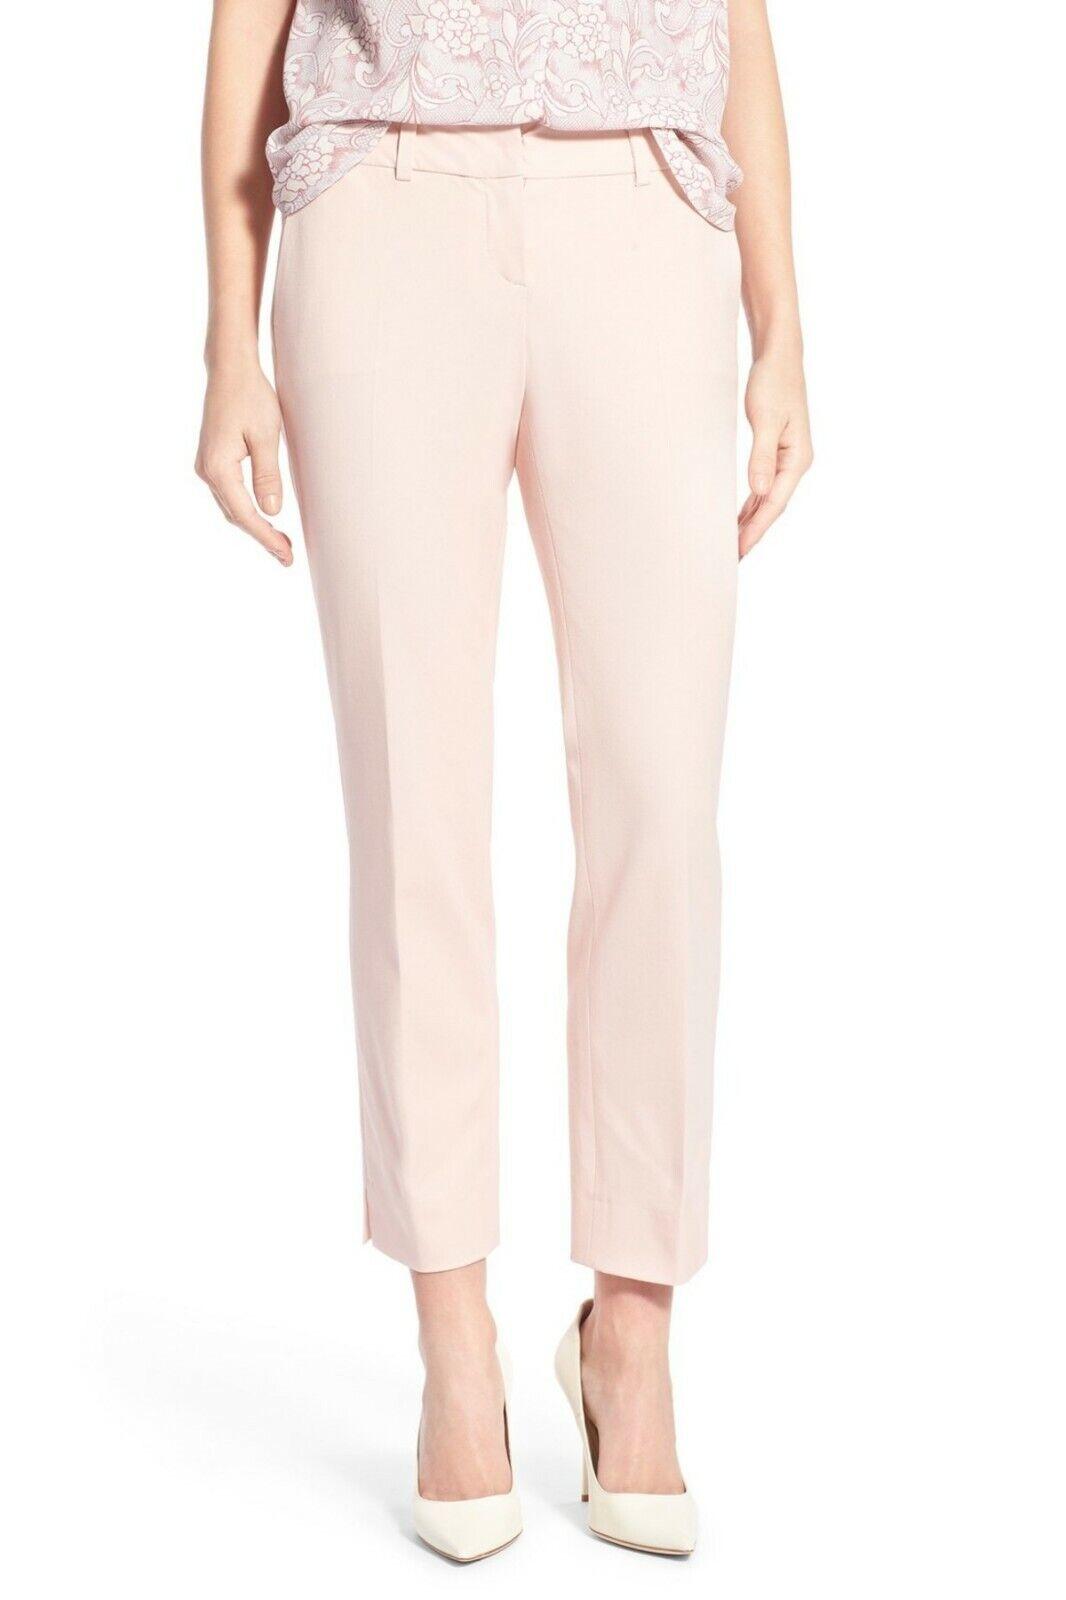 NEW Halogen Soft Pink Stretch Cropped Pants Cotton Blend Sz 8 NEW